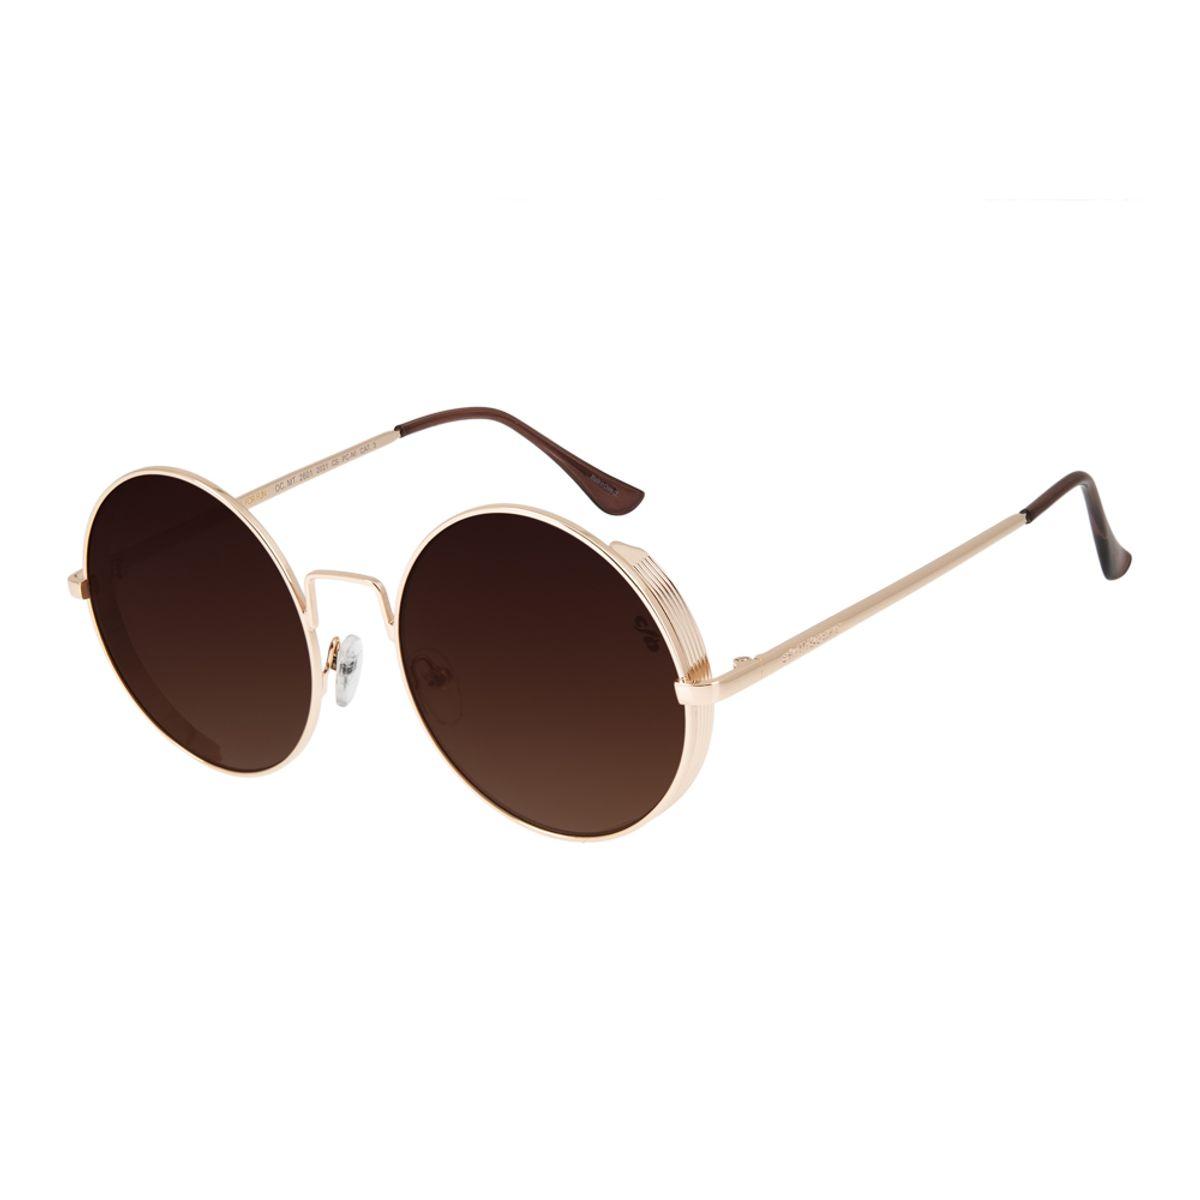 643cf1766 Óculos de Sol Chilli Beans Unissex Redondo Metal Steampunk Dourado ...